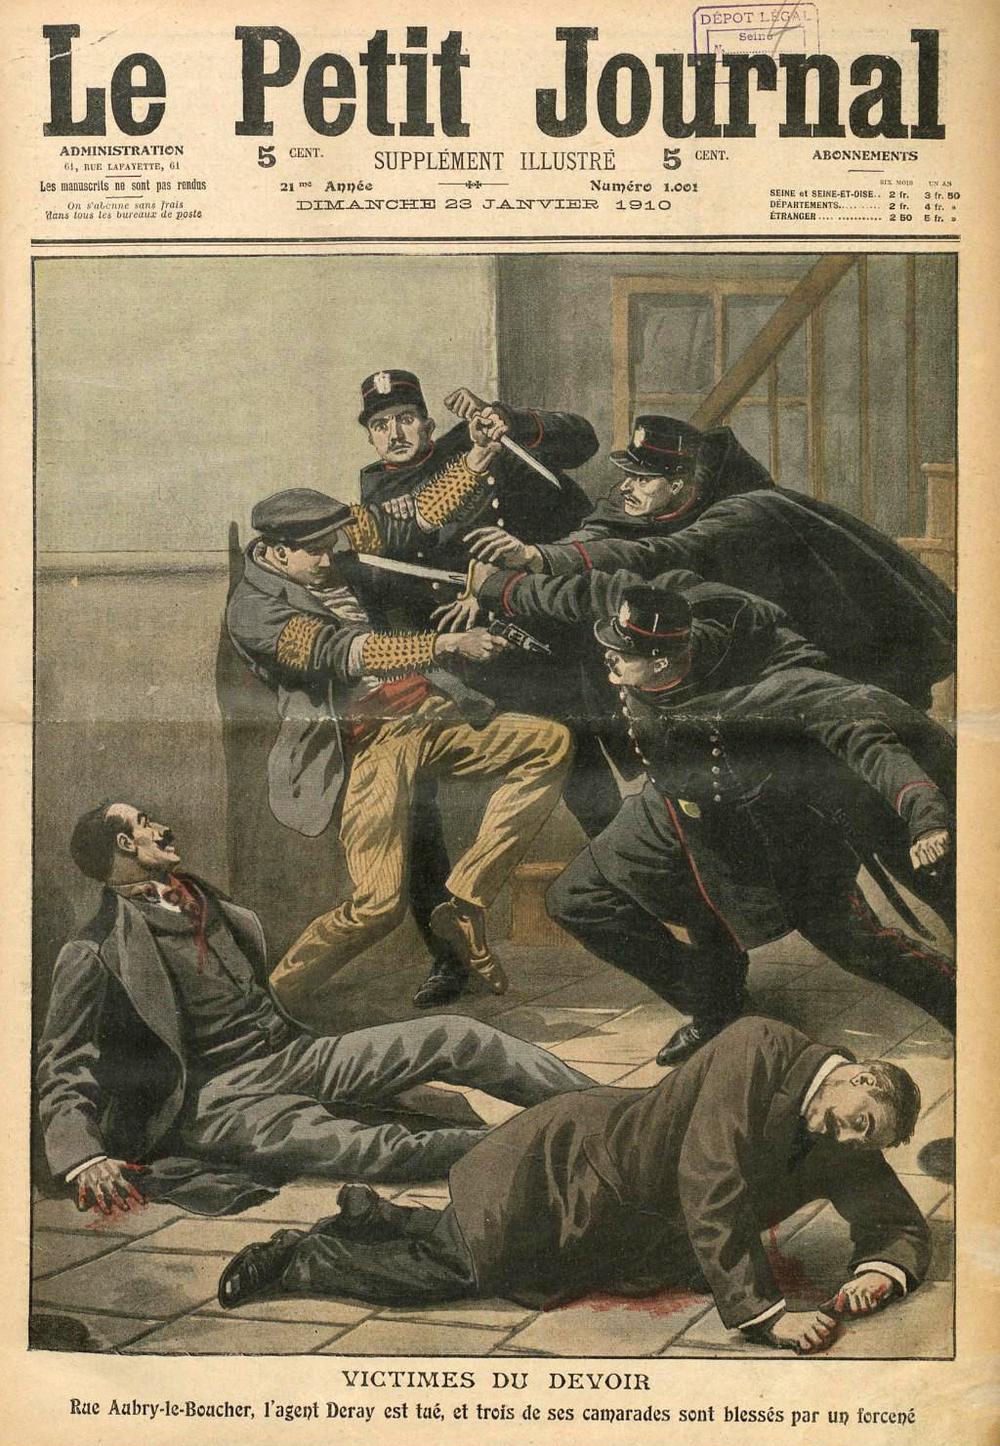 Liabeuf, provisto de sus brazaletes afilados, se enfrenta a los agentes antes de ser detenido